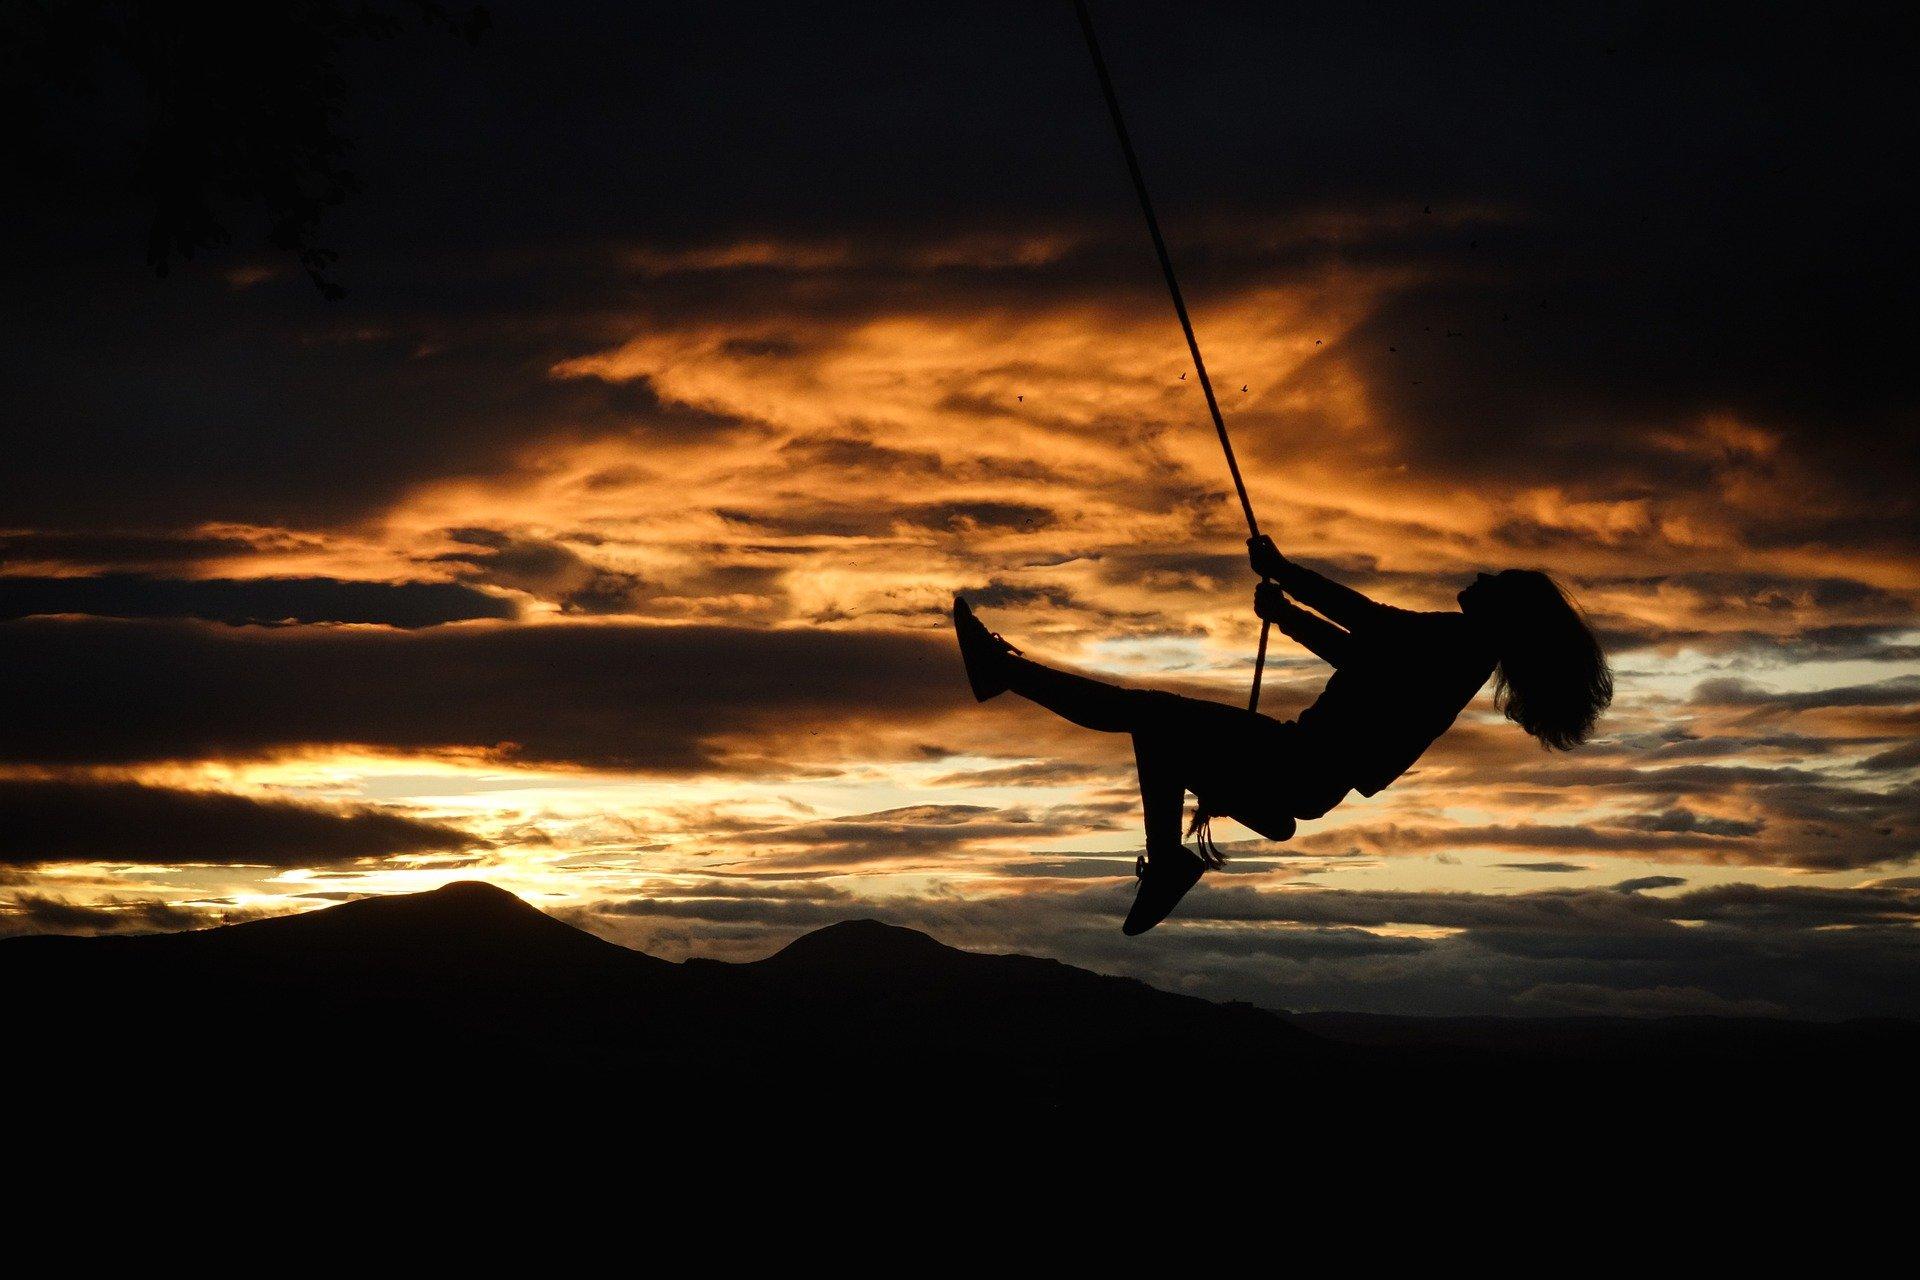 sunset-5737120_1920